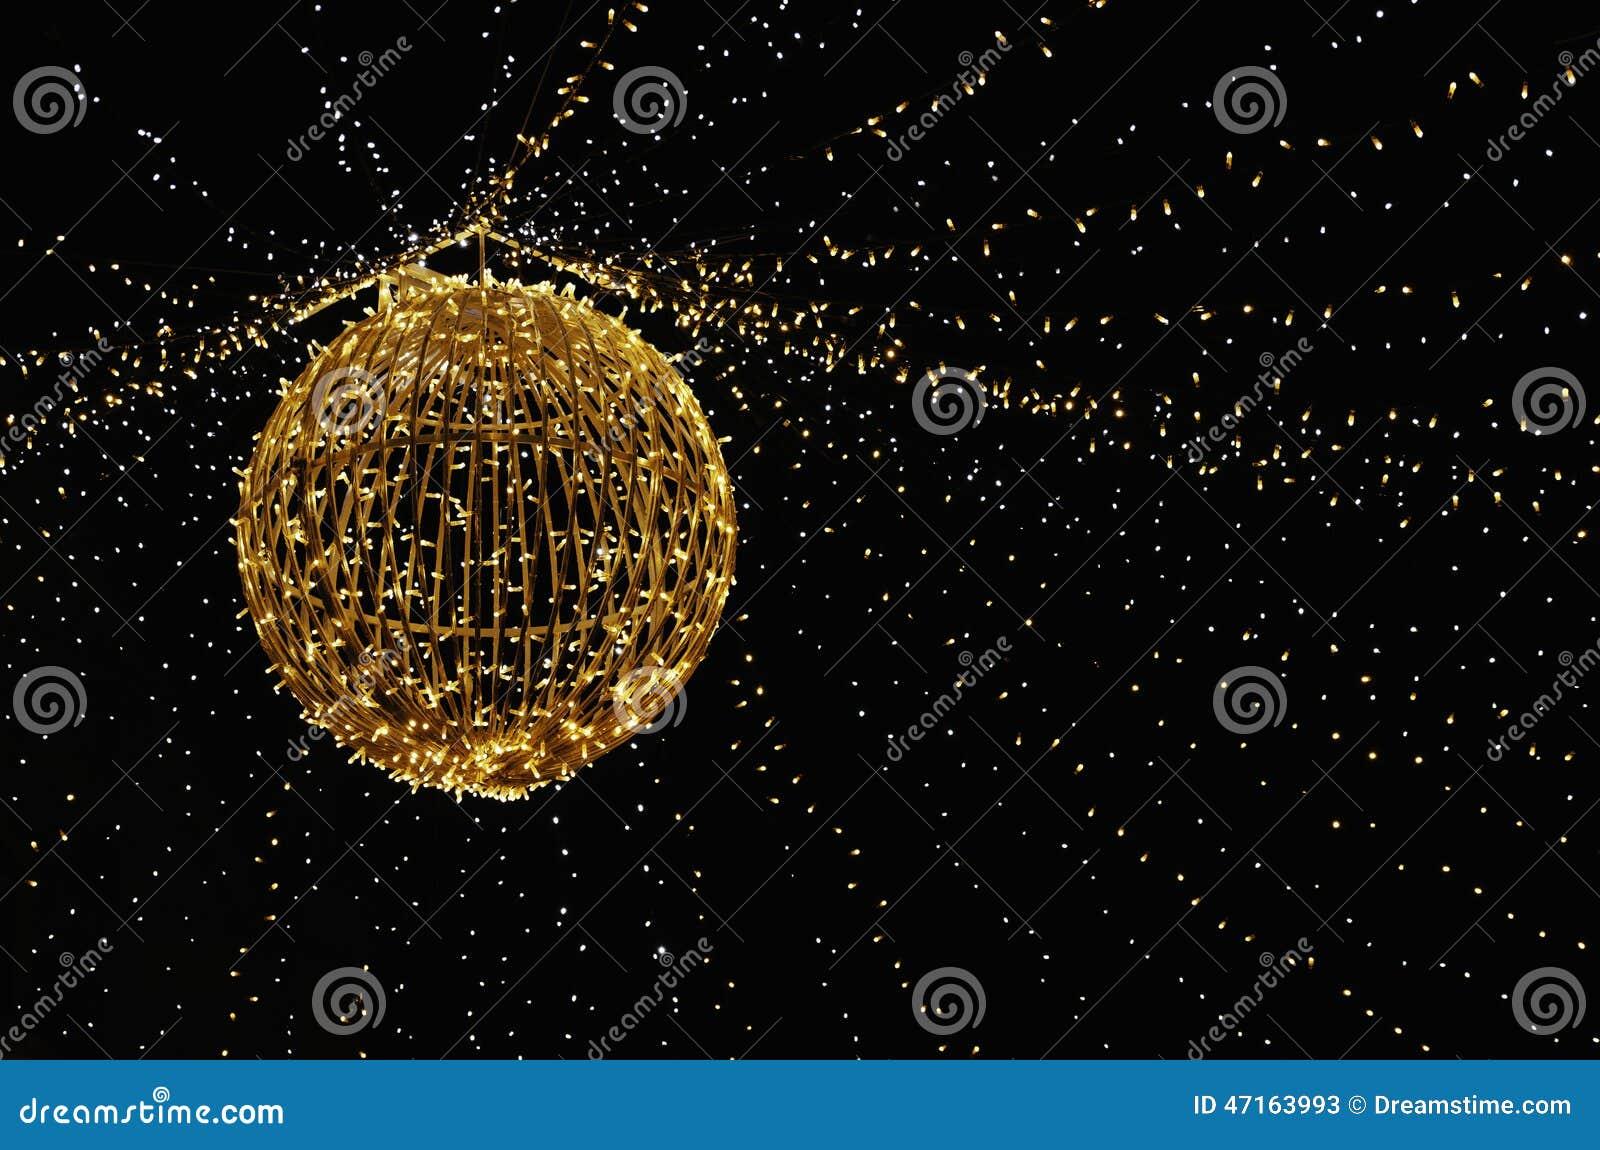 download twinkling christmas lights stock image image of twinkling 47163993